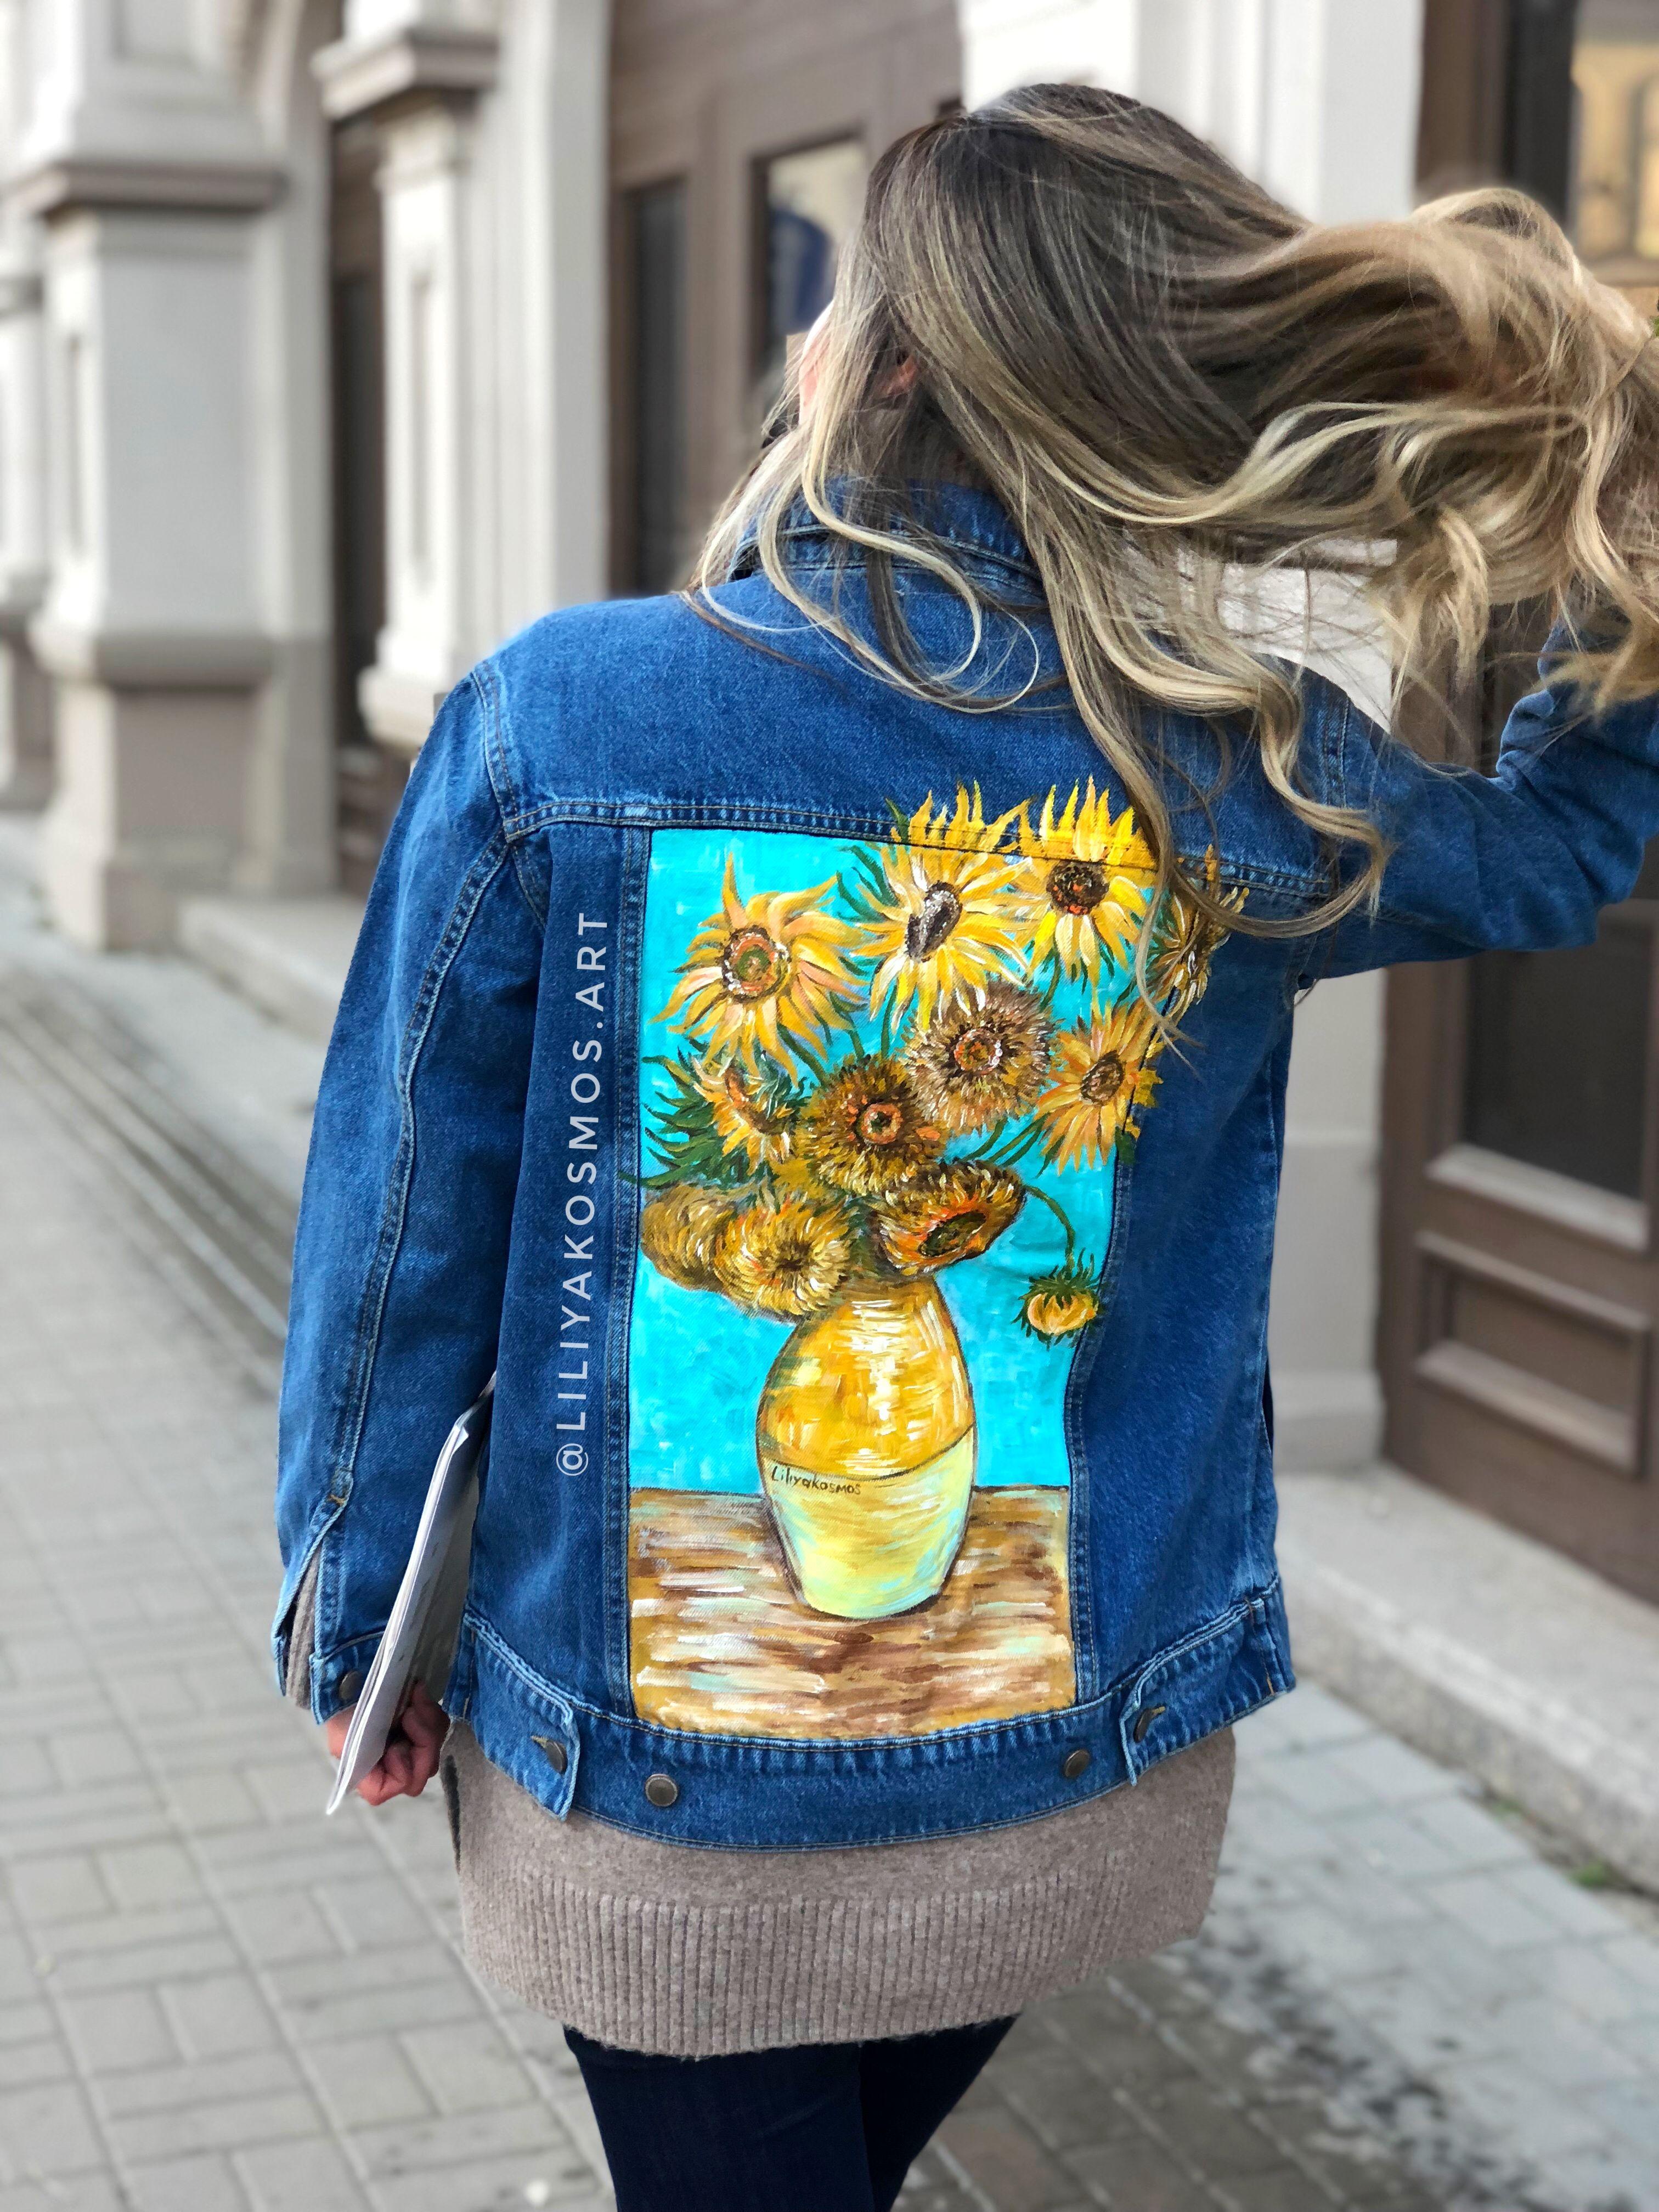 Painted Custom Van Gogh Sunflowers Denim Jacket Price Only Etsy In 2021 Painted Jacket Painted Denim Jacket Hand Painted Denim Jacket [ 4032 x 3024 Pixel ]